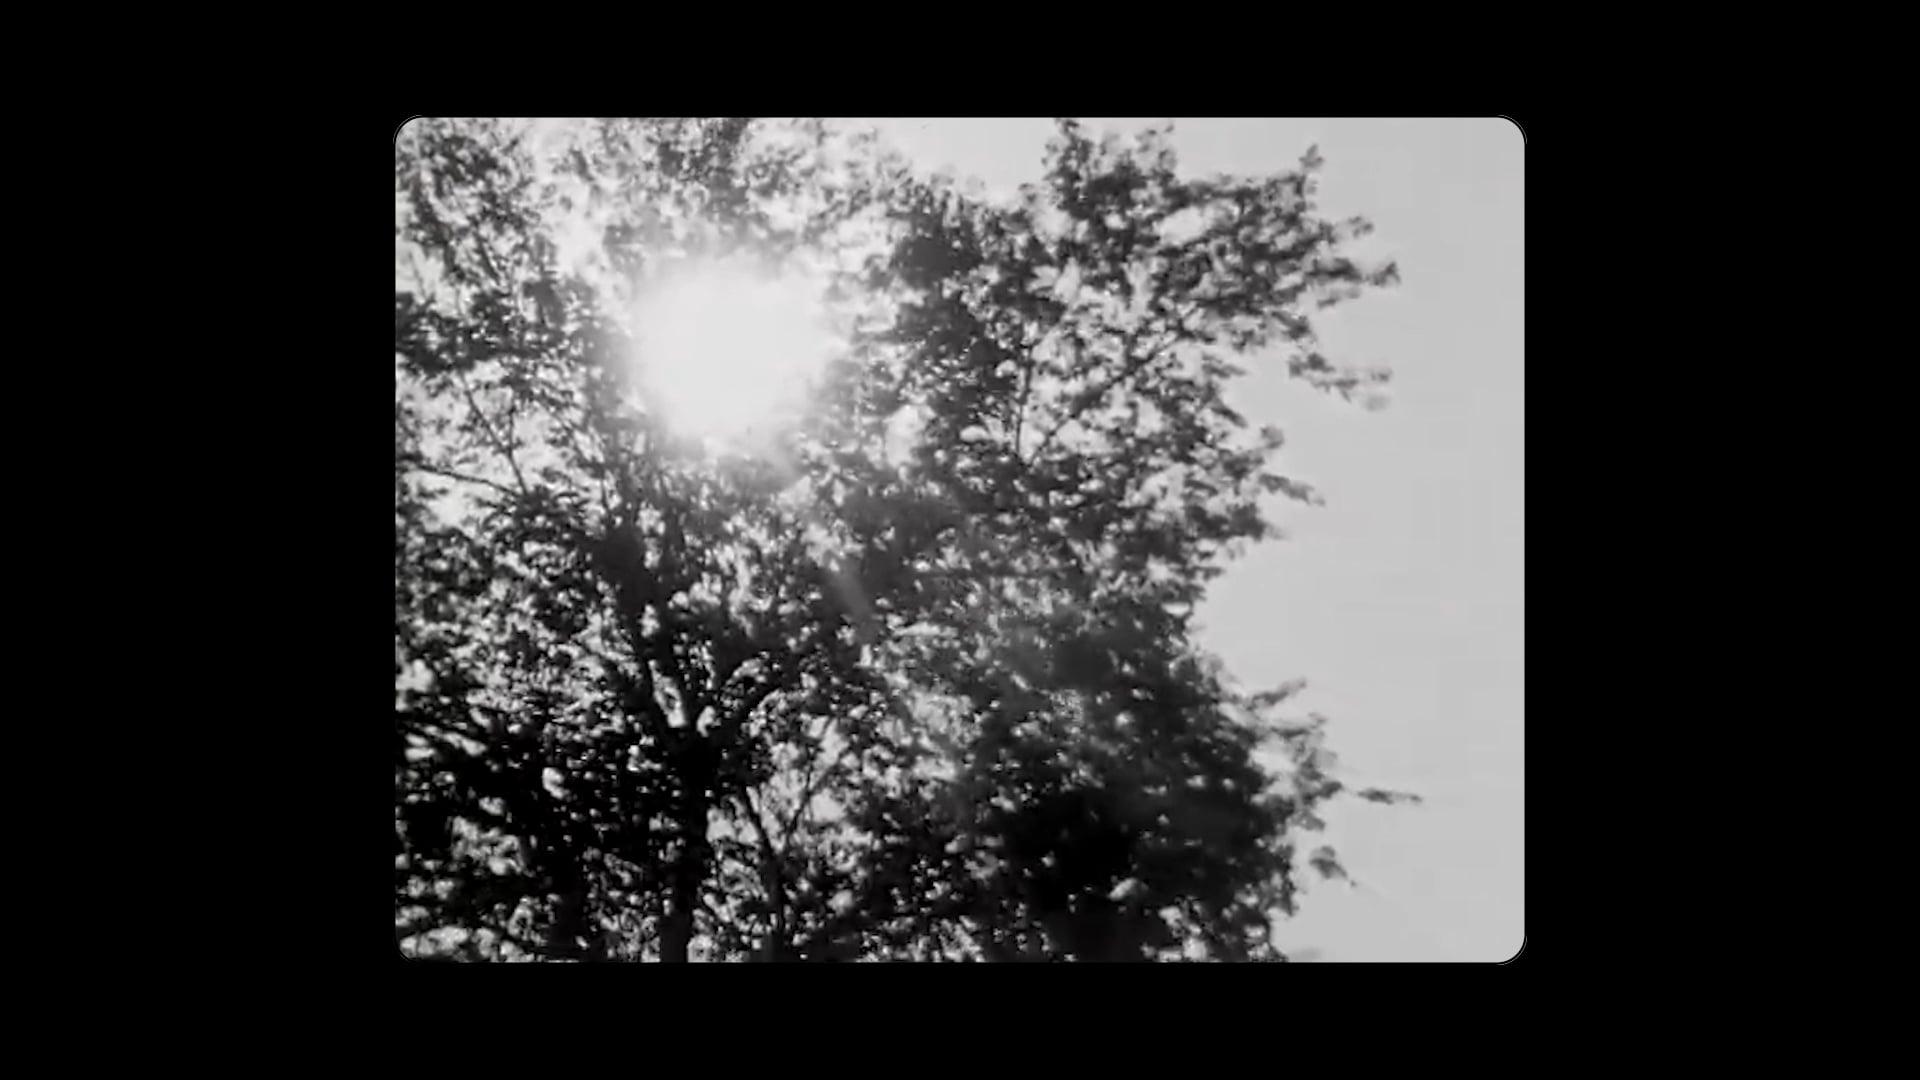 The Other's World   Poem by J Otis Powell   Film by Zachary Thomas Cedarholm